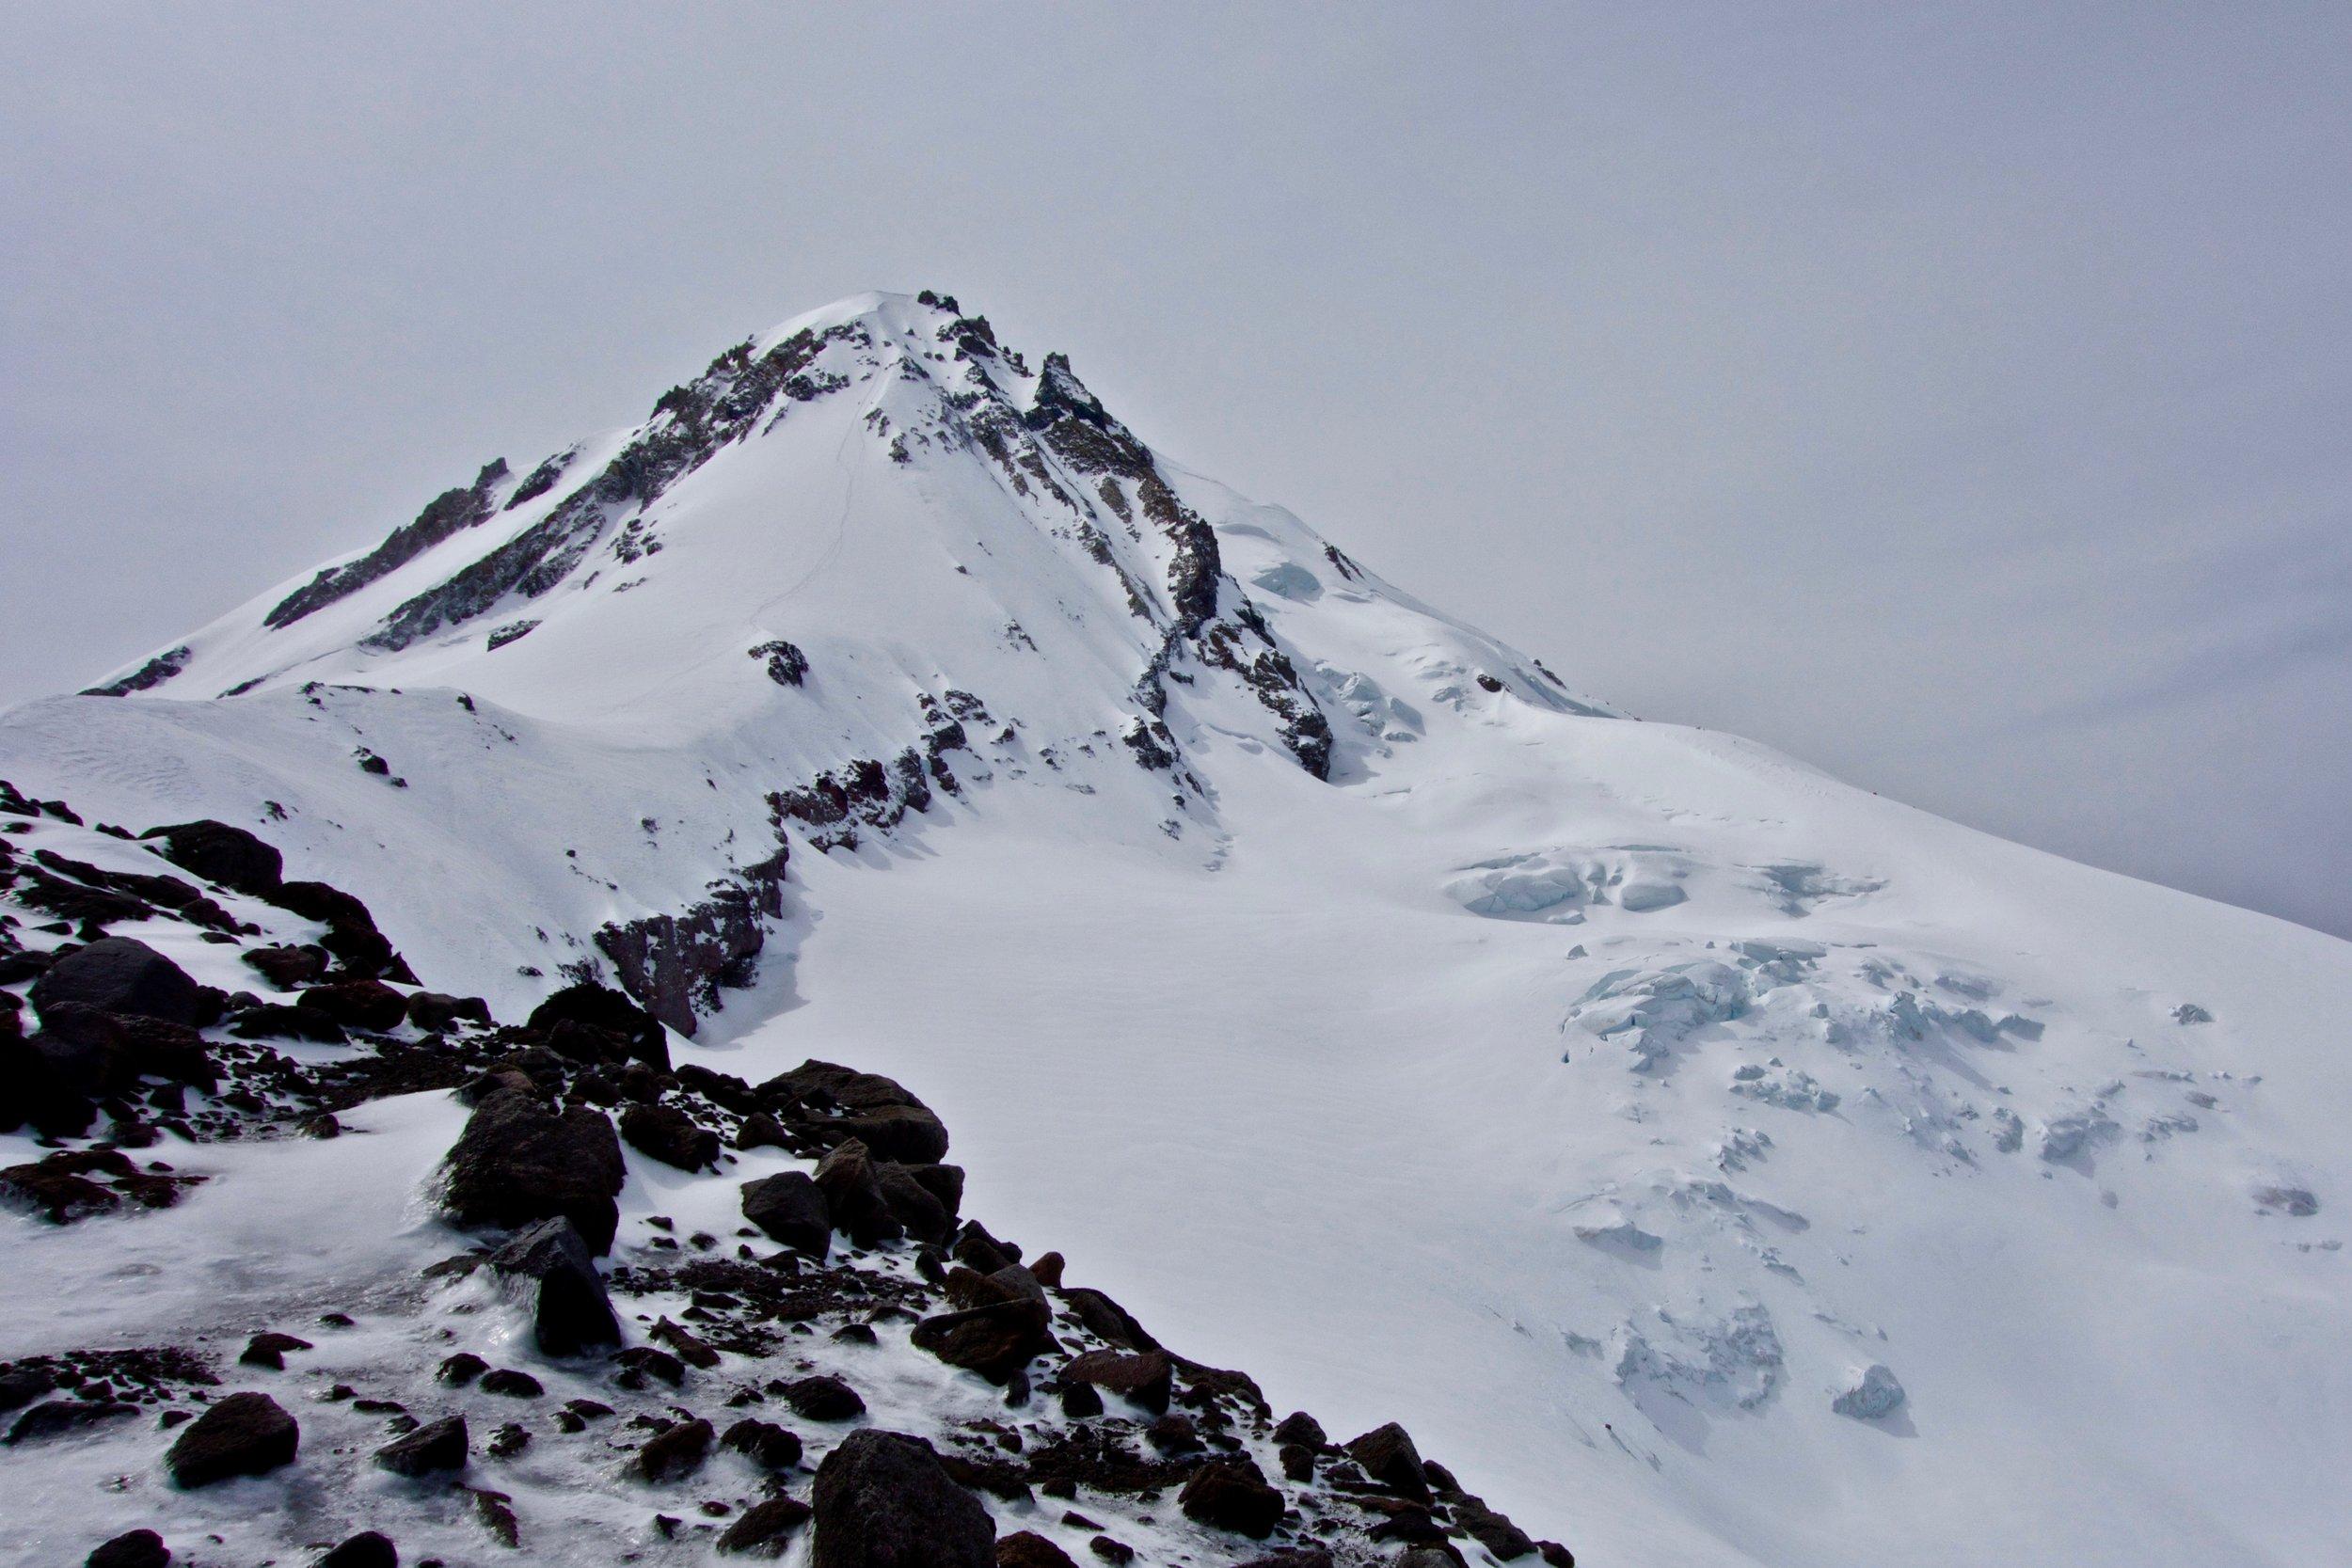 Our descent tracks down Cooper Spur